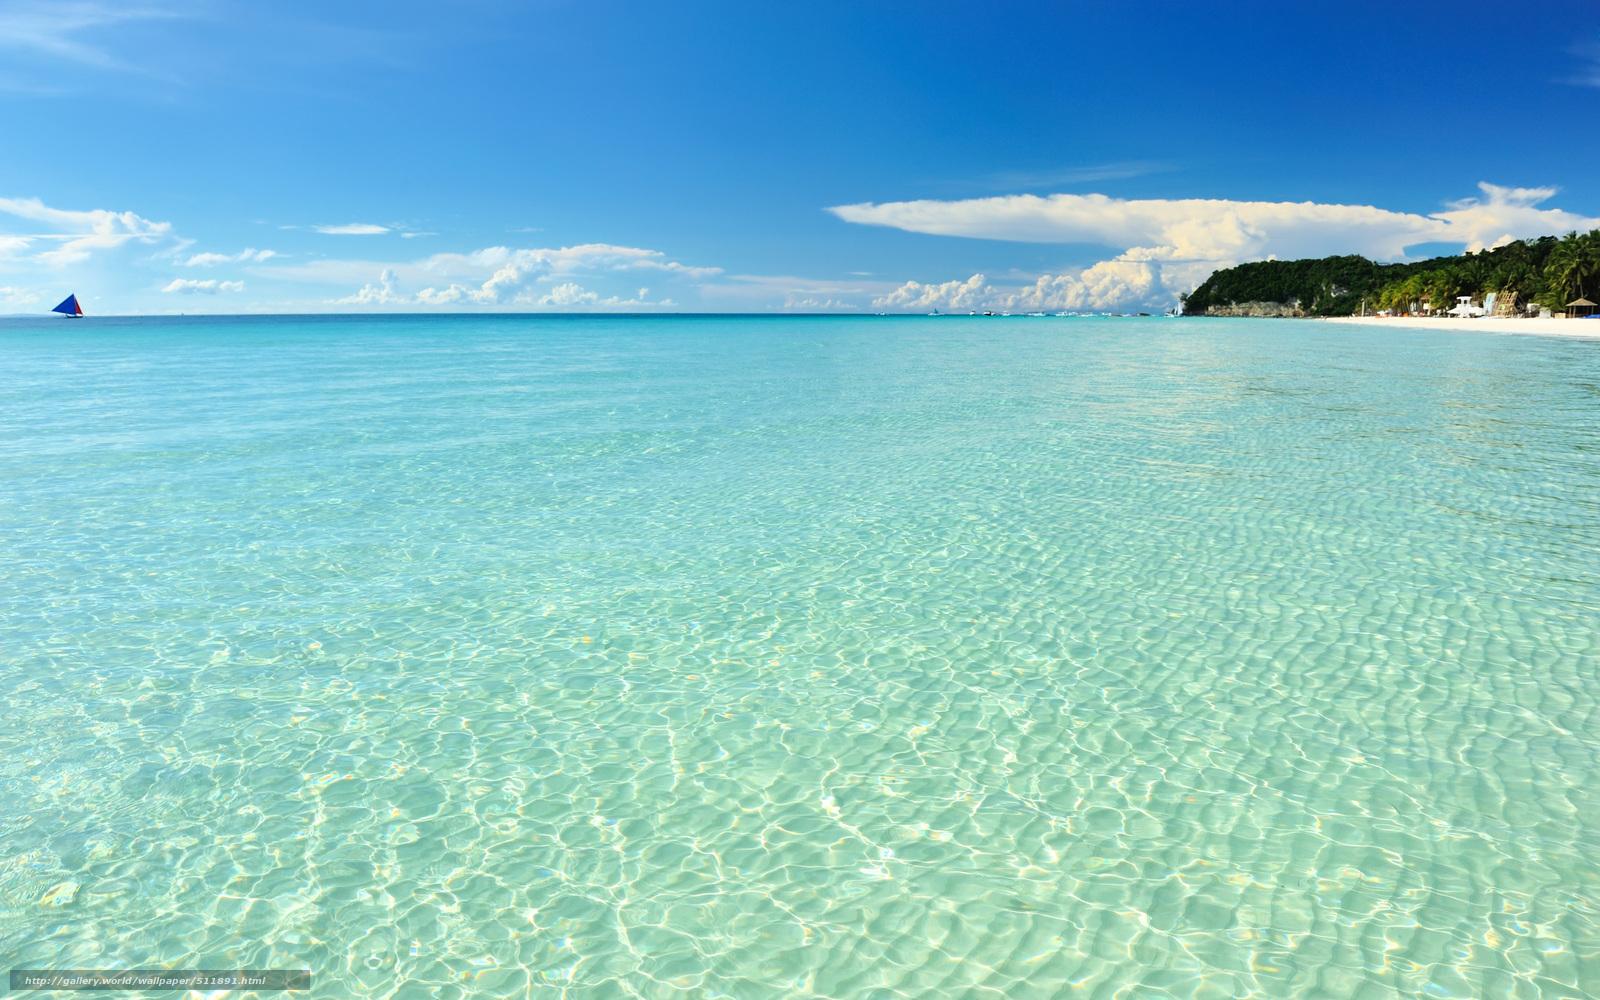 Фото моря красивое